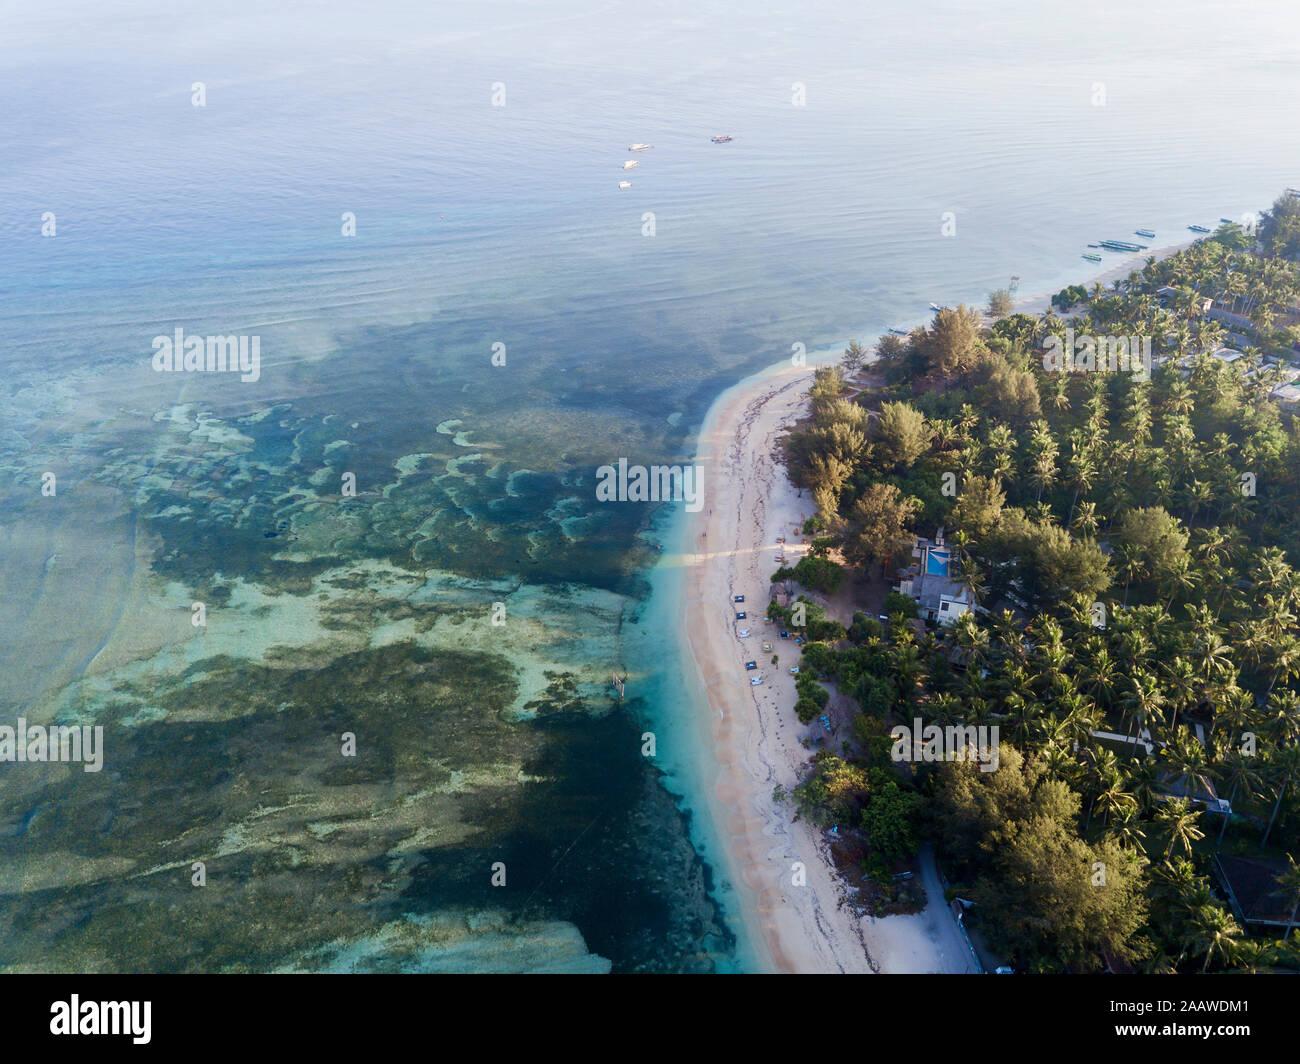 Antenna vista panoramica di Gili-Air isola a Bali, Indonesia Foto Stock